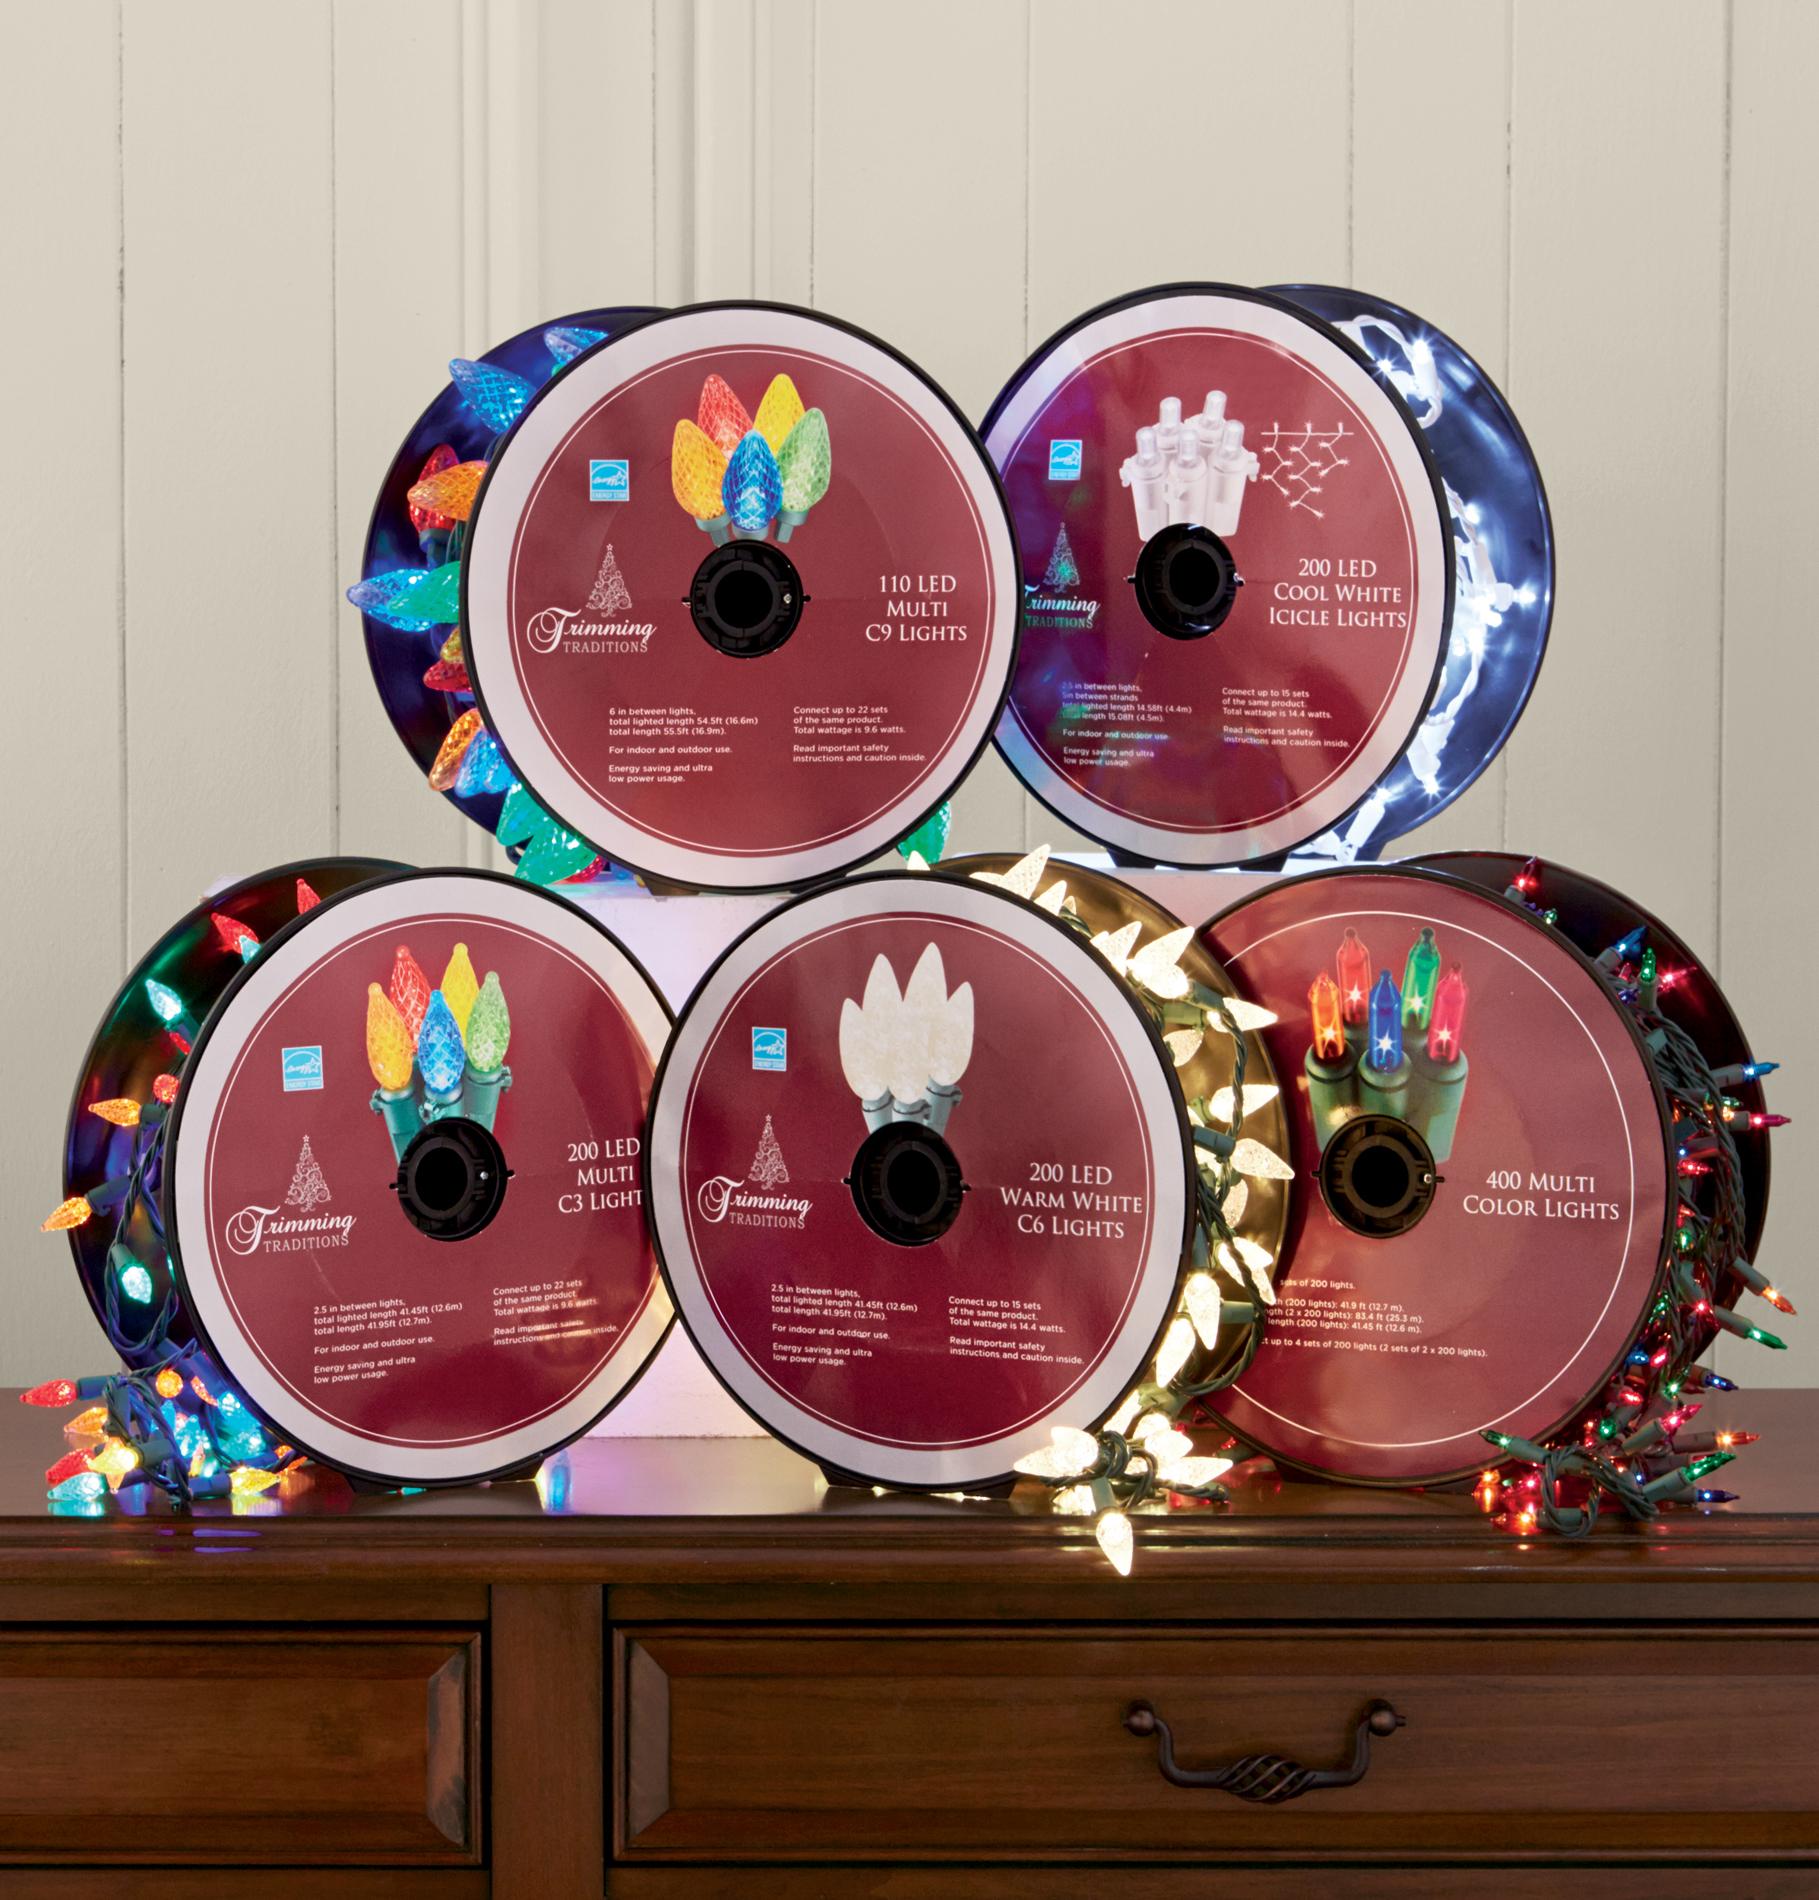 Trimming Traditions LED C3  Christmas  Lights on Reel - Warm White  200 Ct PartNumber: 07144829001P KsnValue: 07144829001 MfgPartNumber: TT-200L-C3